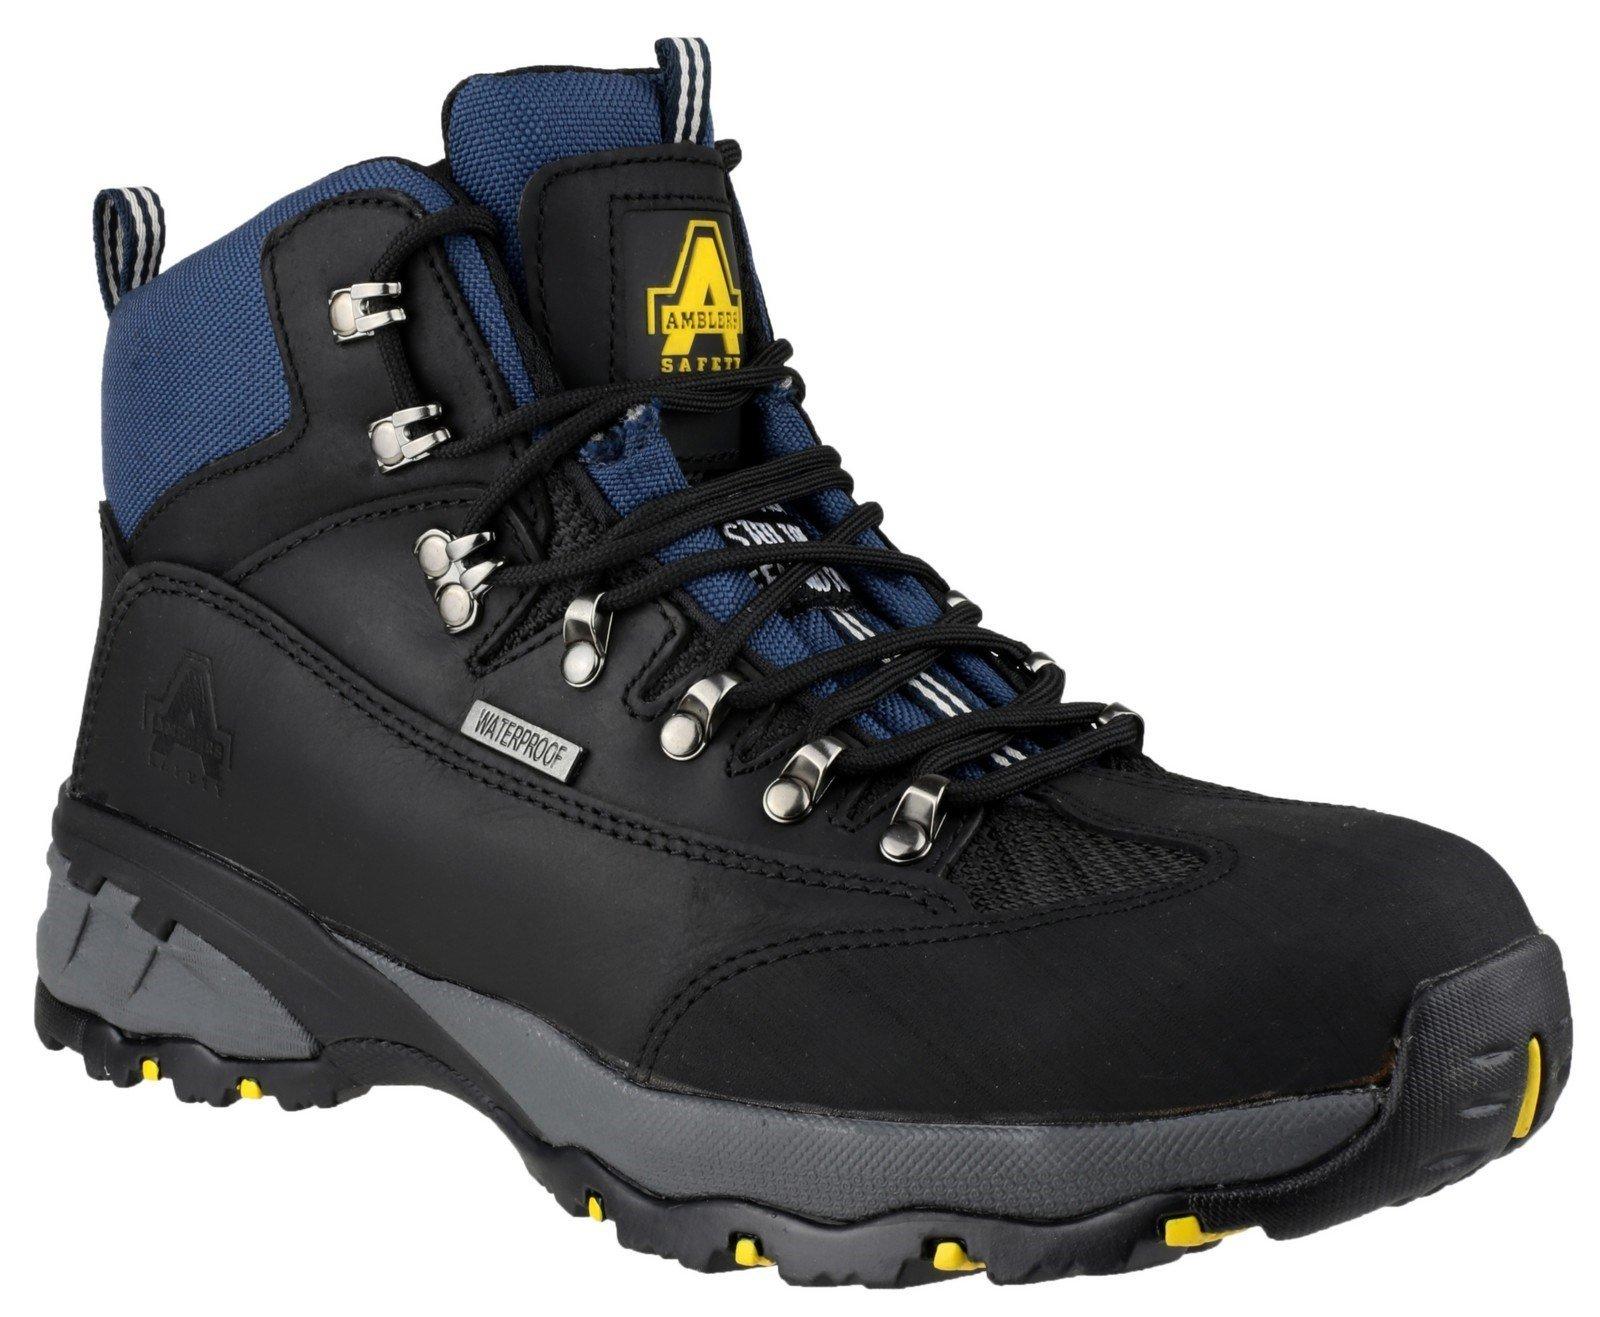 Amblers Unisex Safety Waterproof Lace up Hiker Boot Black 09635 - Black 6